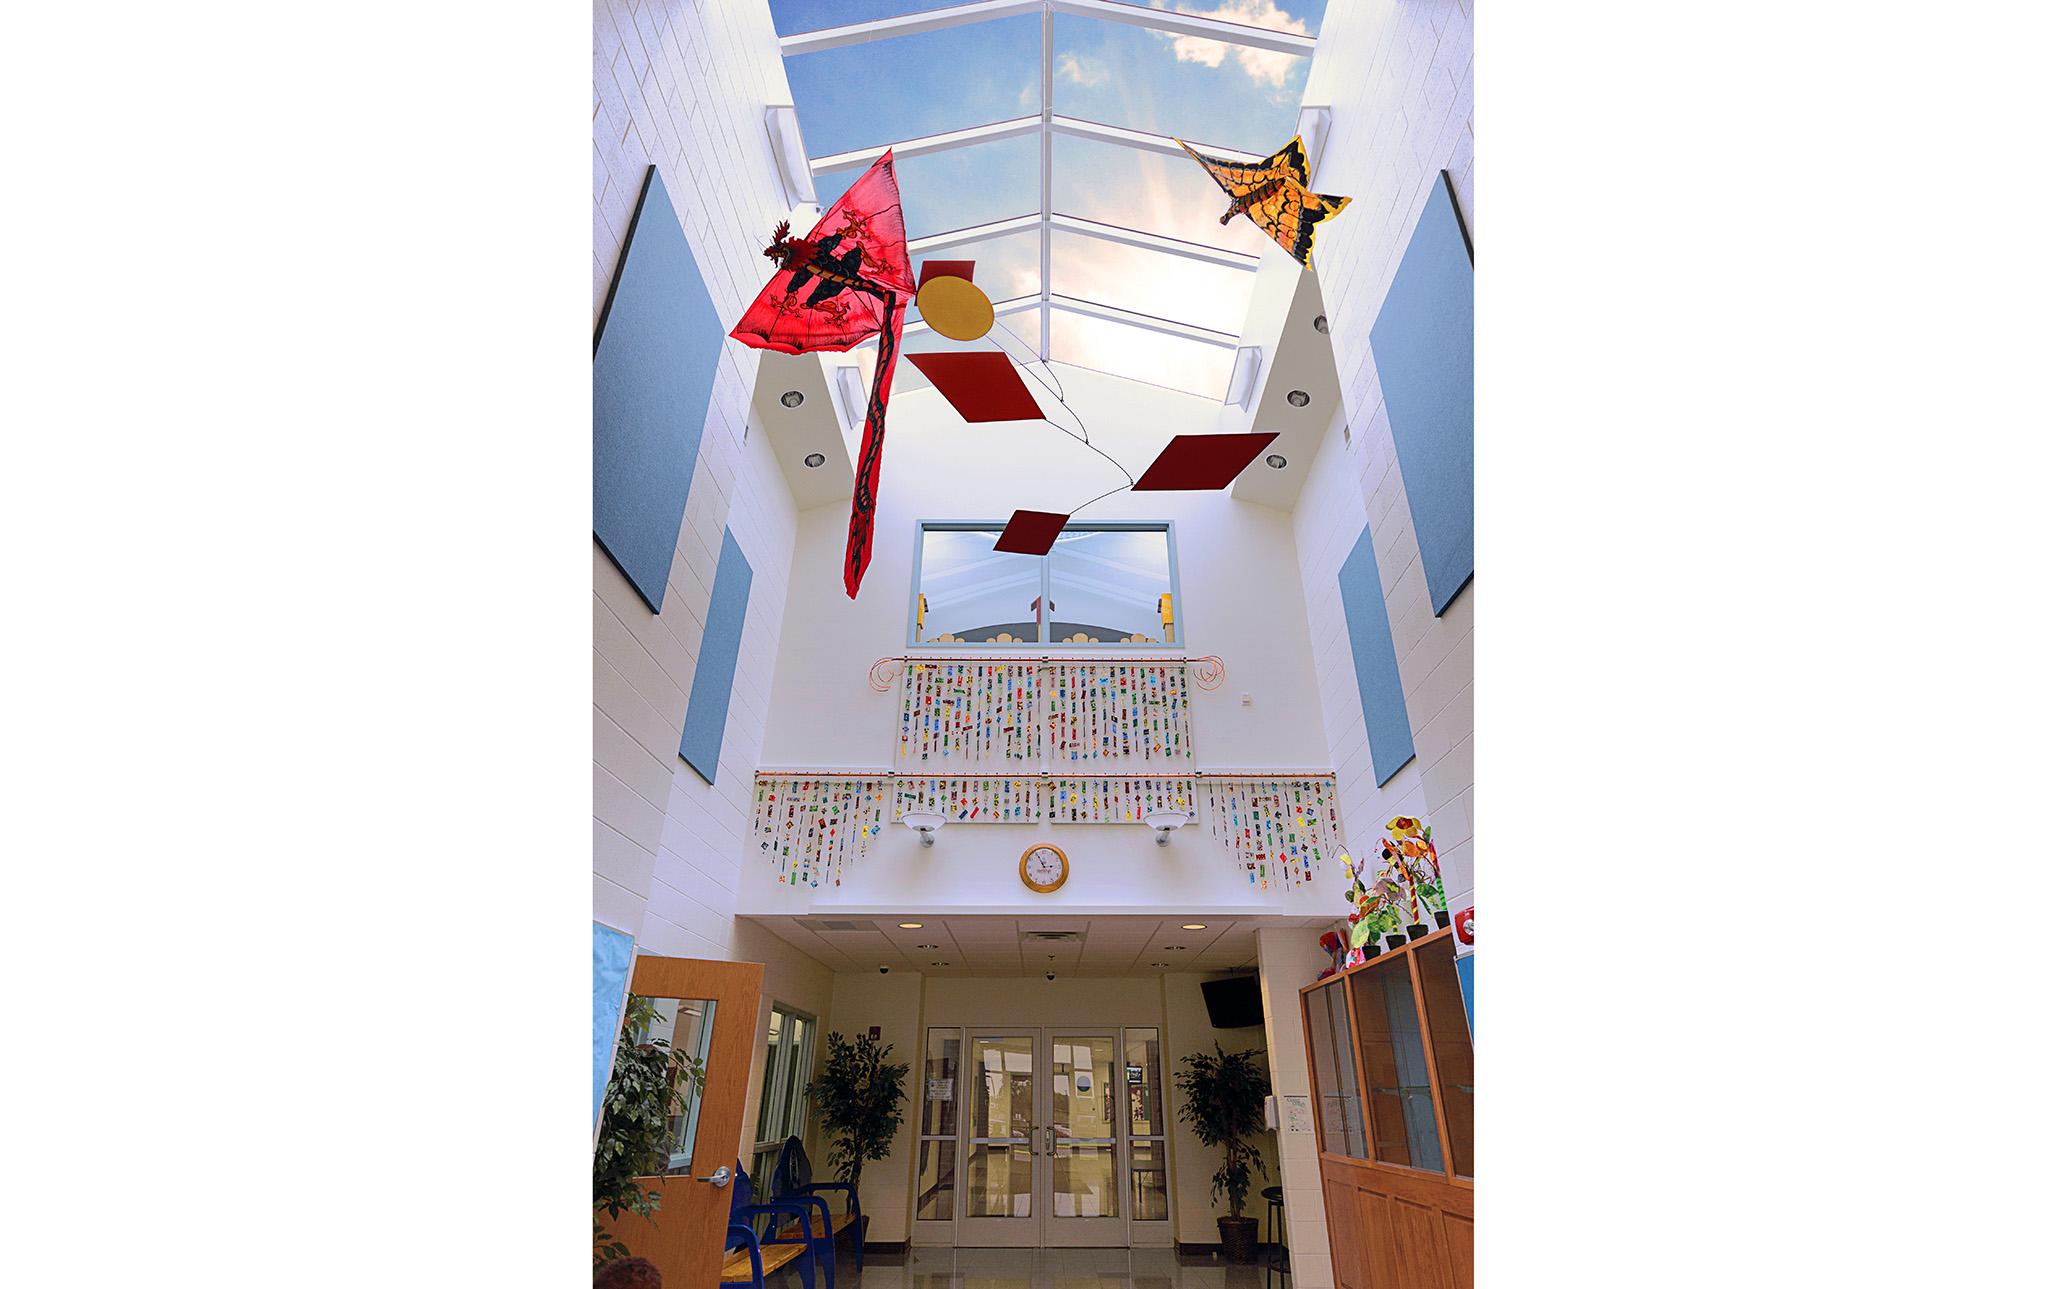 3_Mountain-Bay-Elementary-School